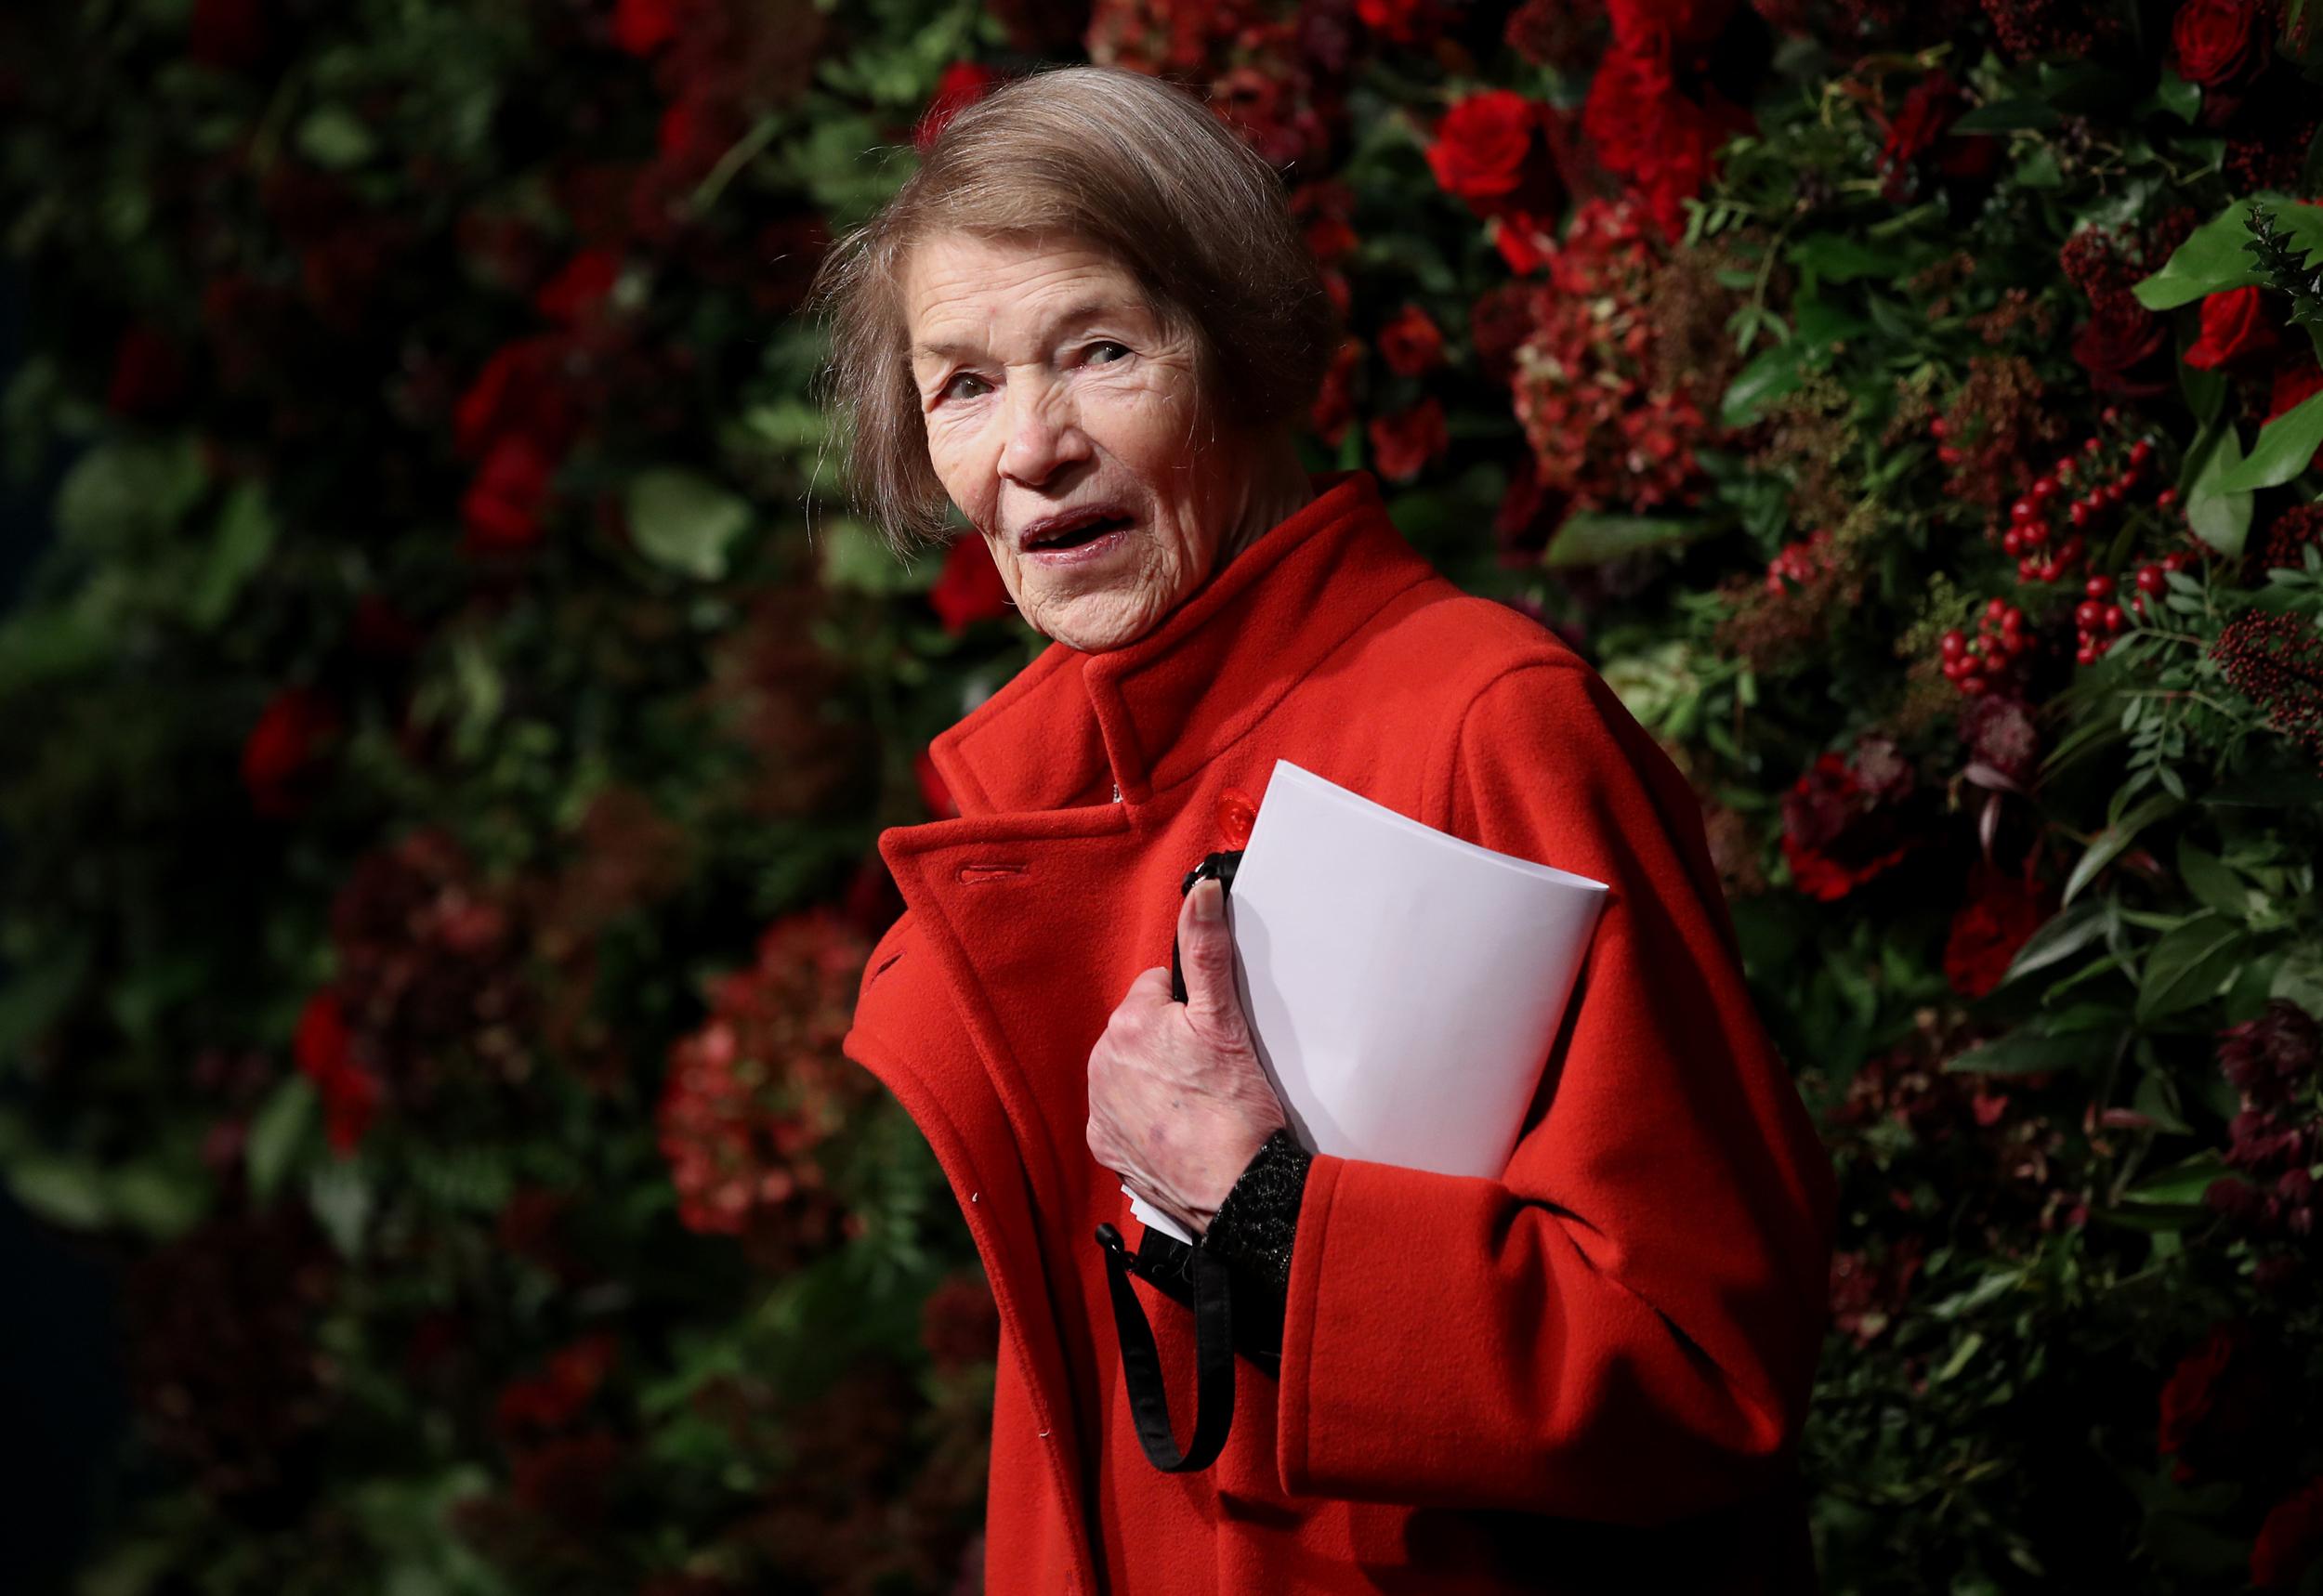 Glenda-Jackson,-84-wins-BAFTA-television-award